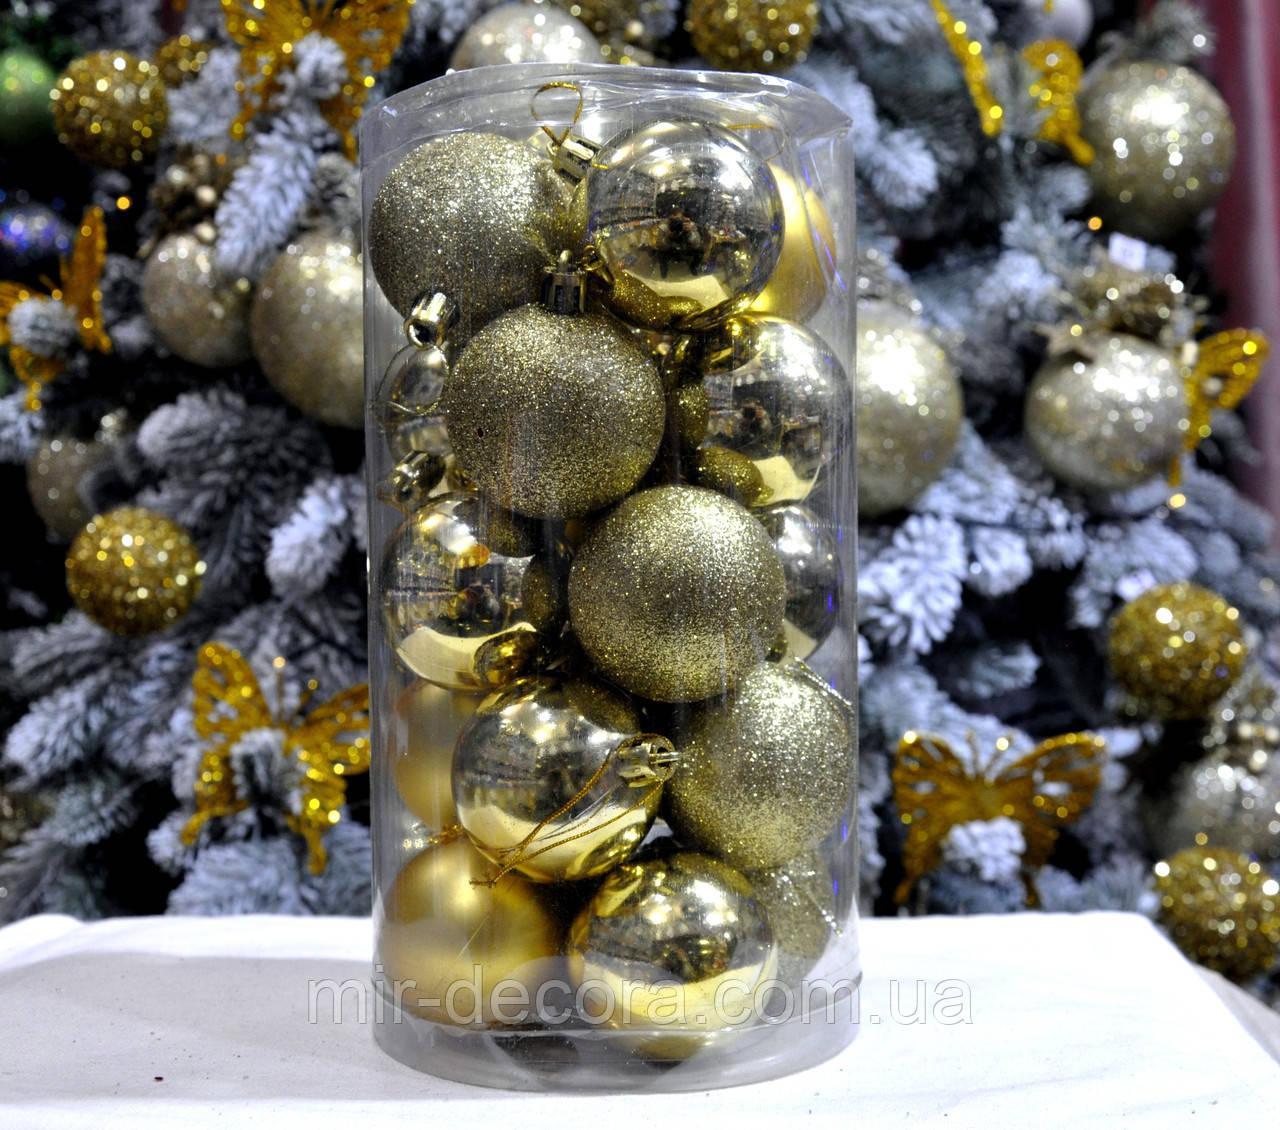 Набор новогодних шаров (пластик) 20 шт, диаметр 50 мм. Цвет золото.